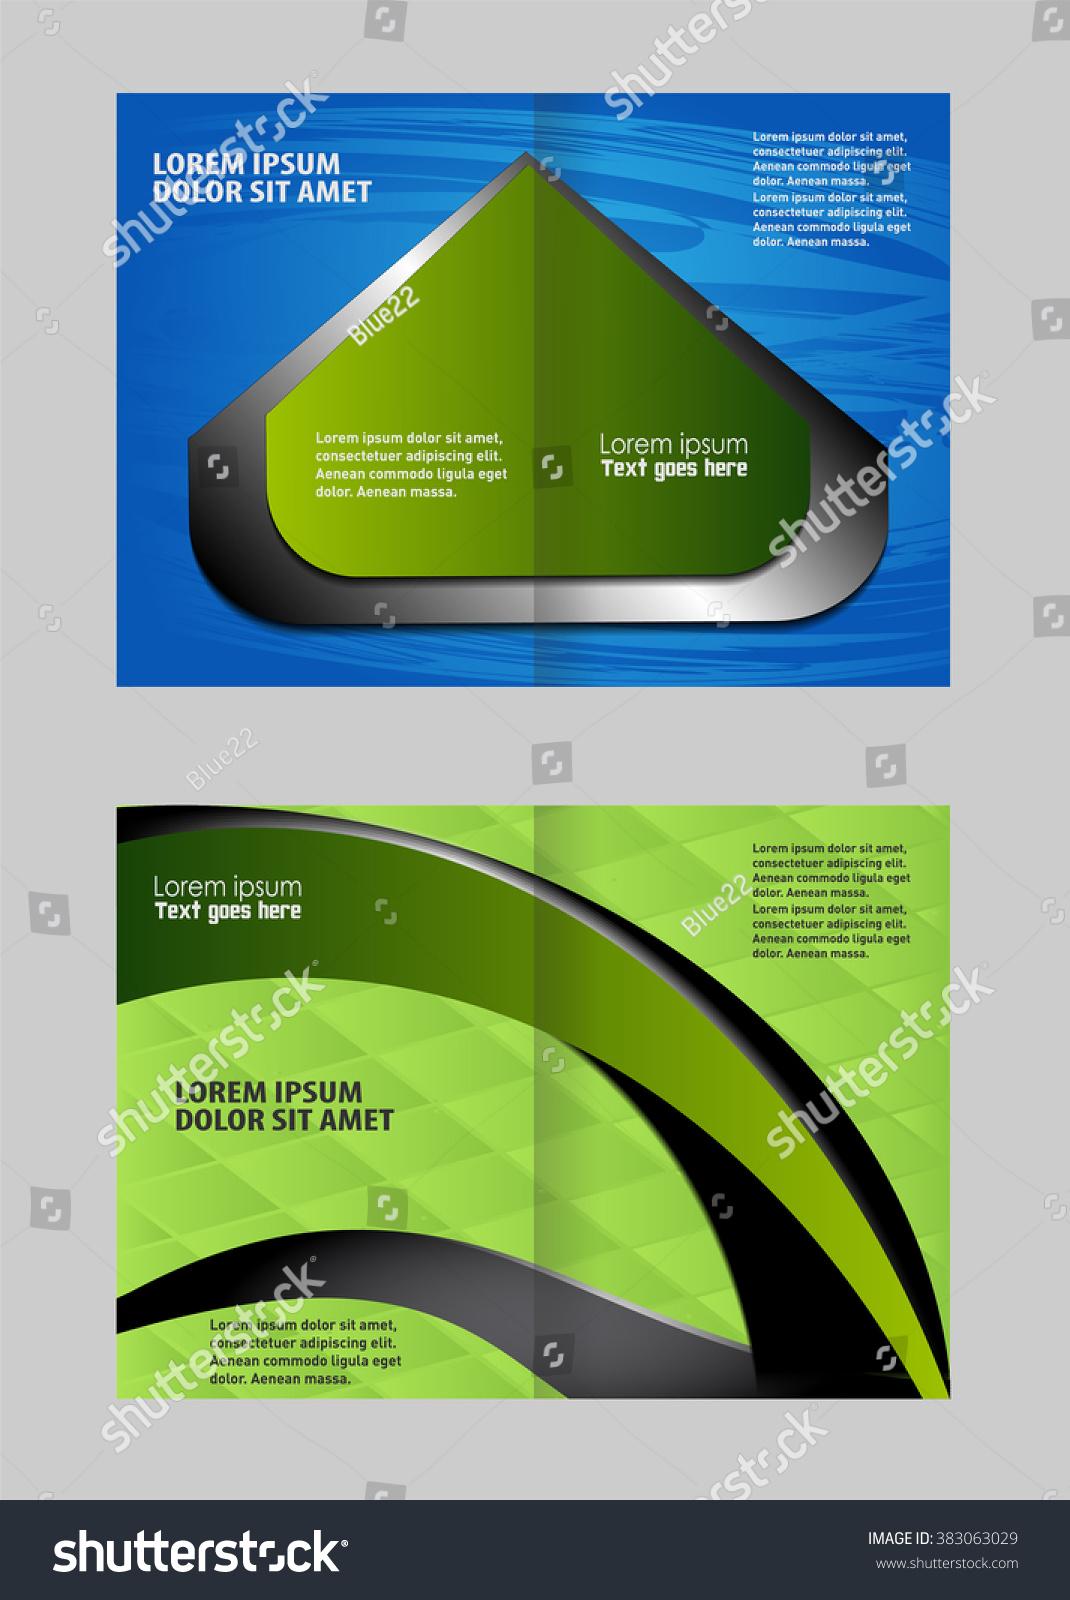 advertising brochure template - template advertising brochure stock vector 383063029